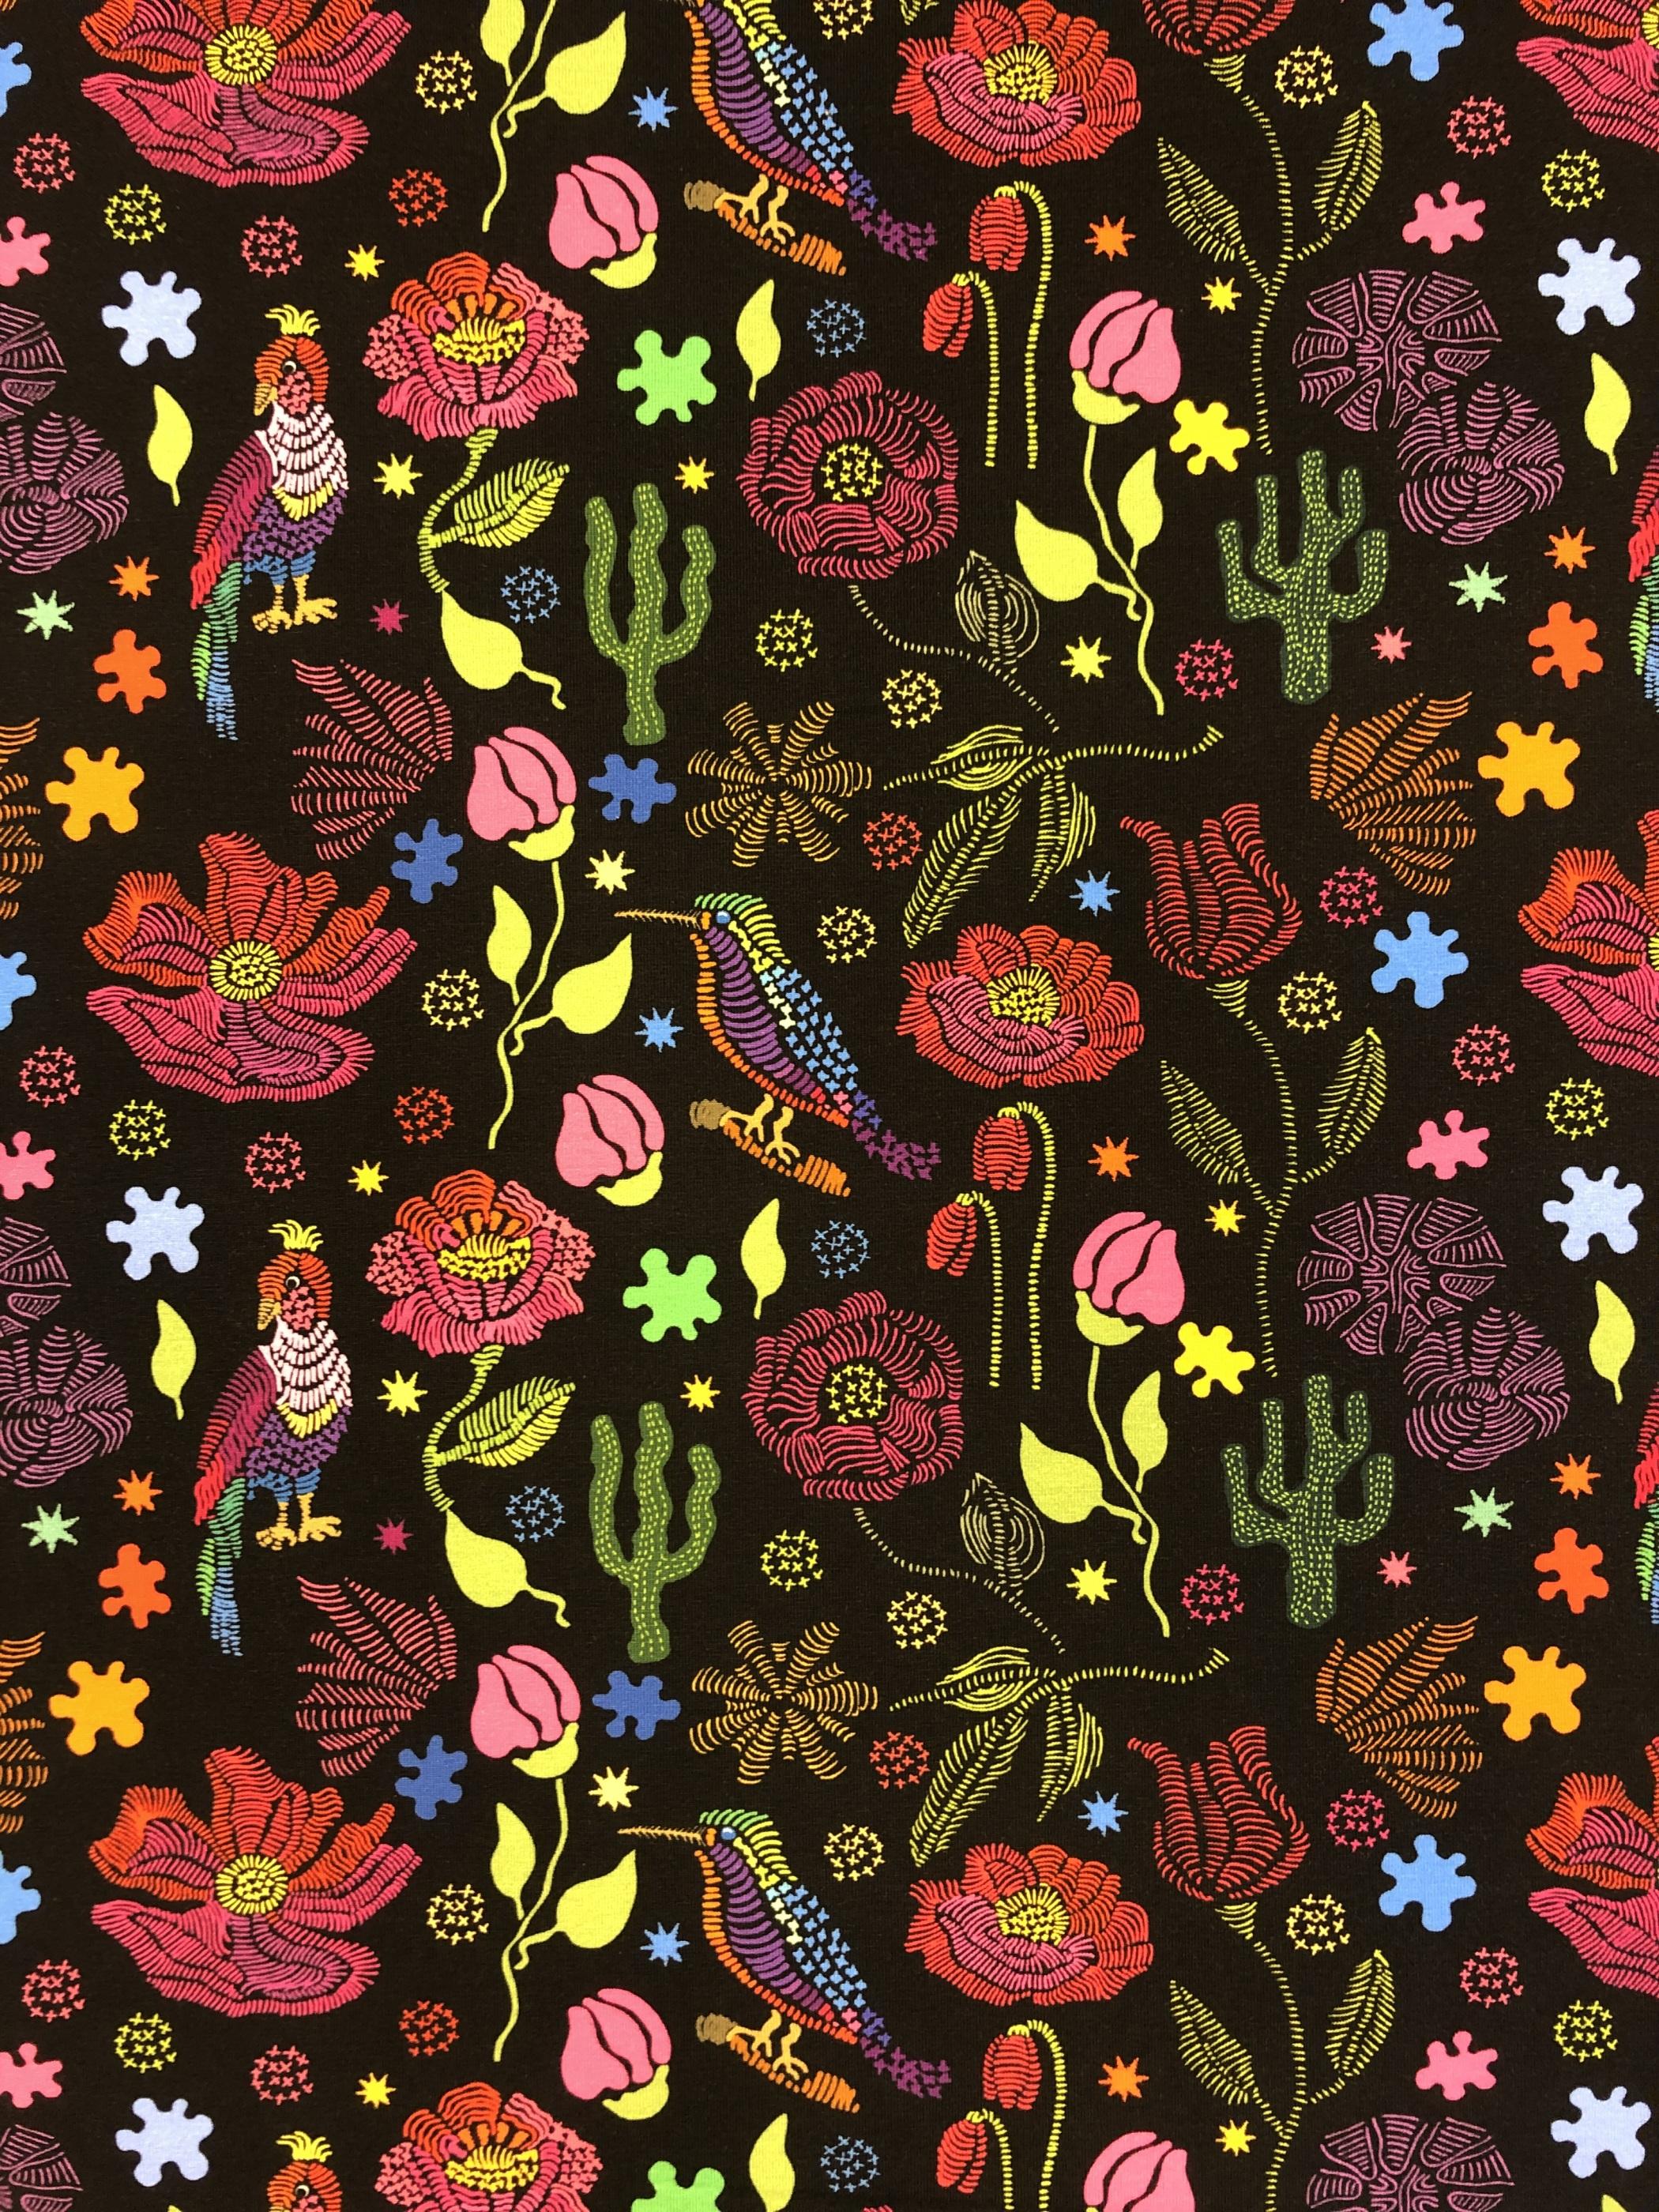 Kaktus tex fåglar fågel blommor svart färgglatt bomullstrikå metervara tyg Tyglust Laholm